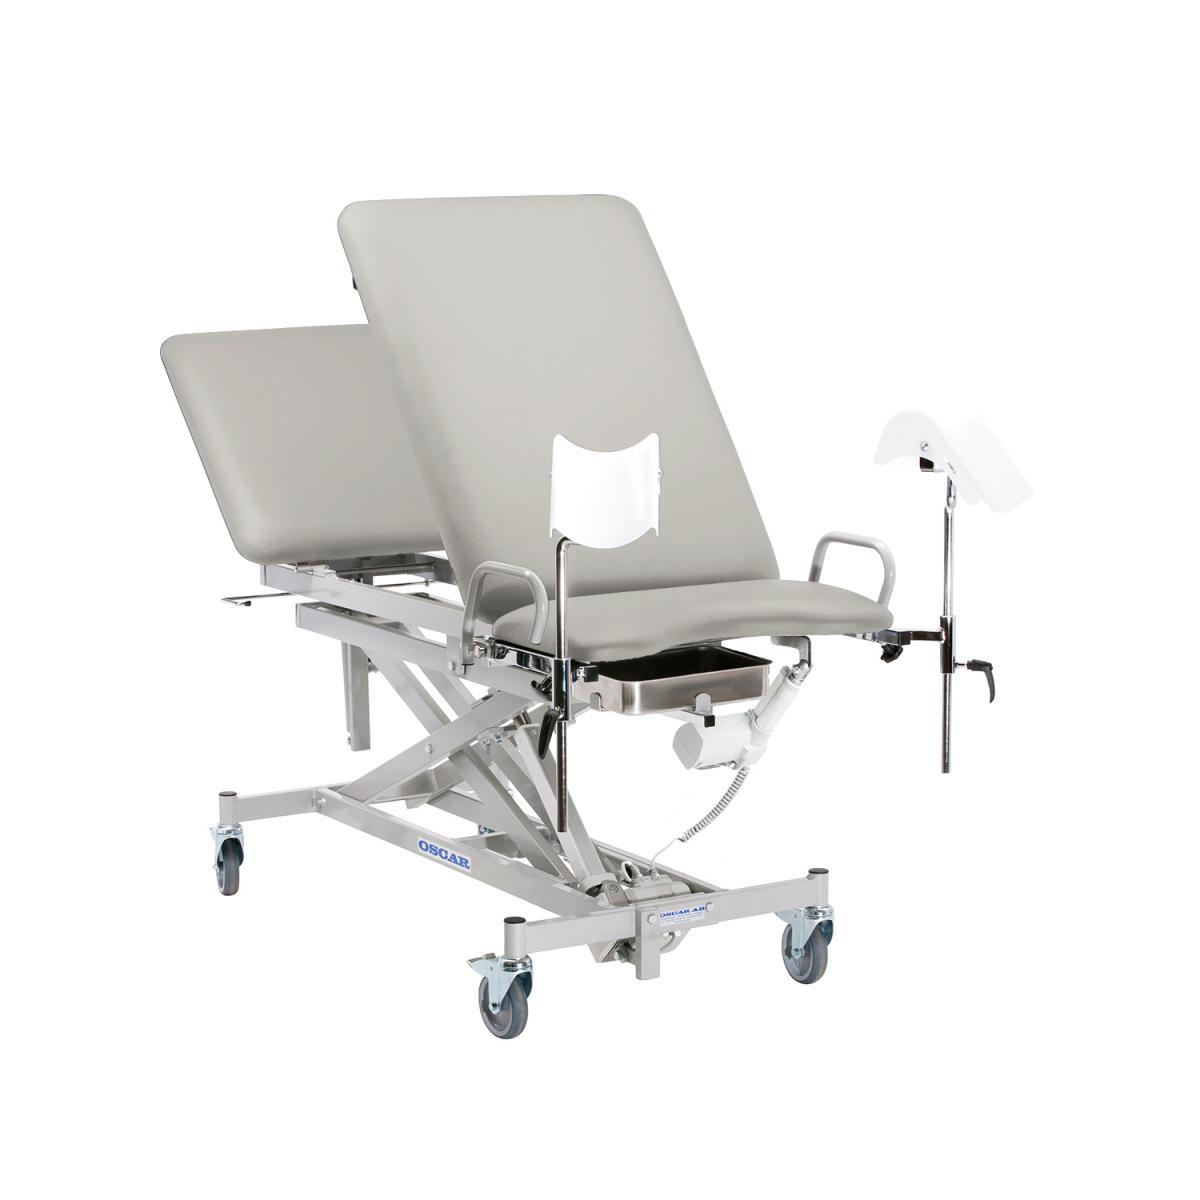 Gynaecological examination combi 932